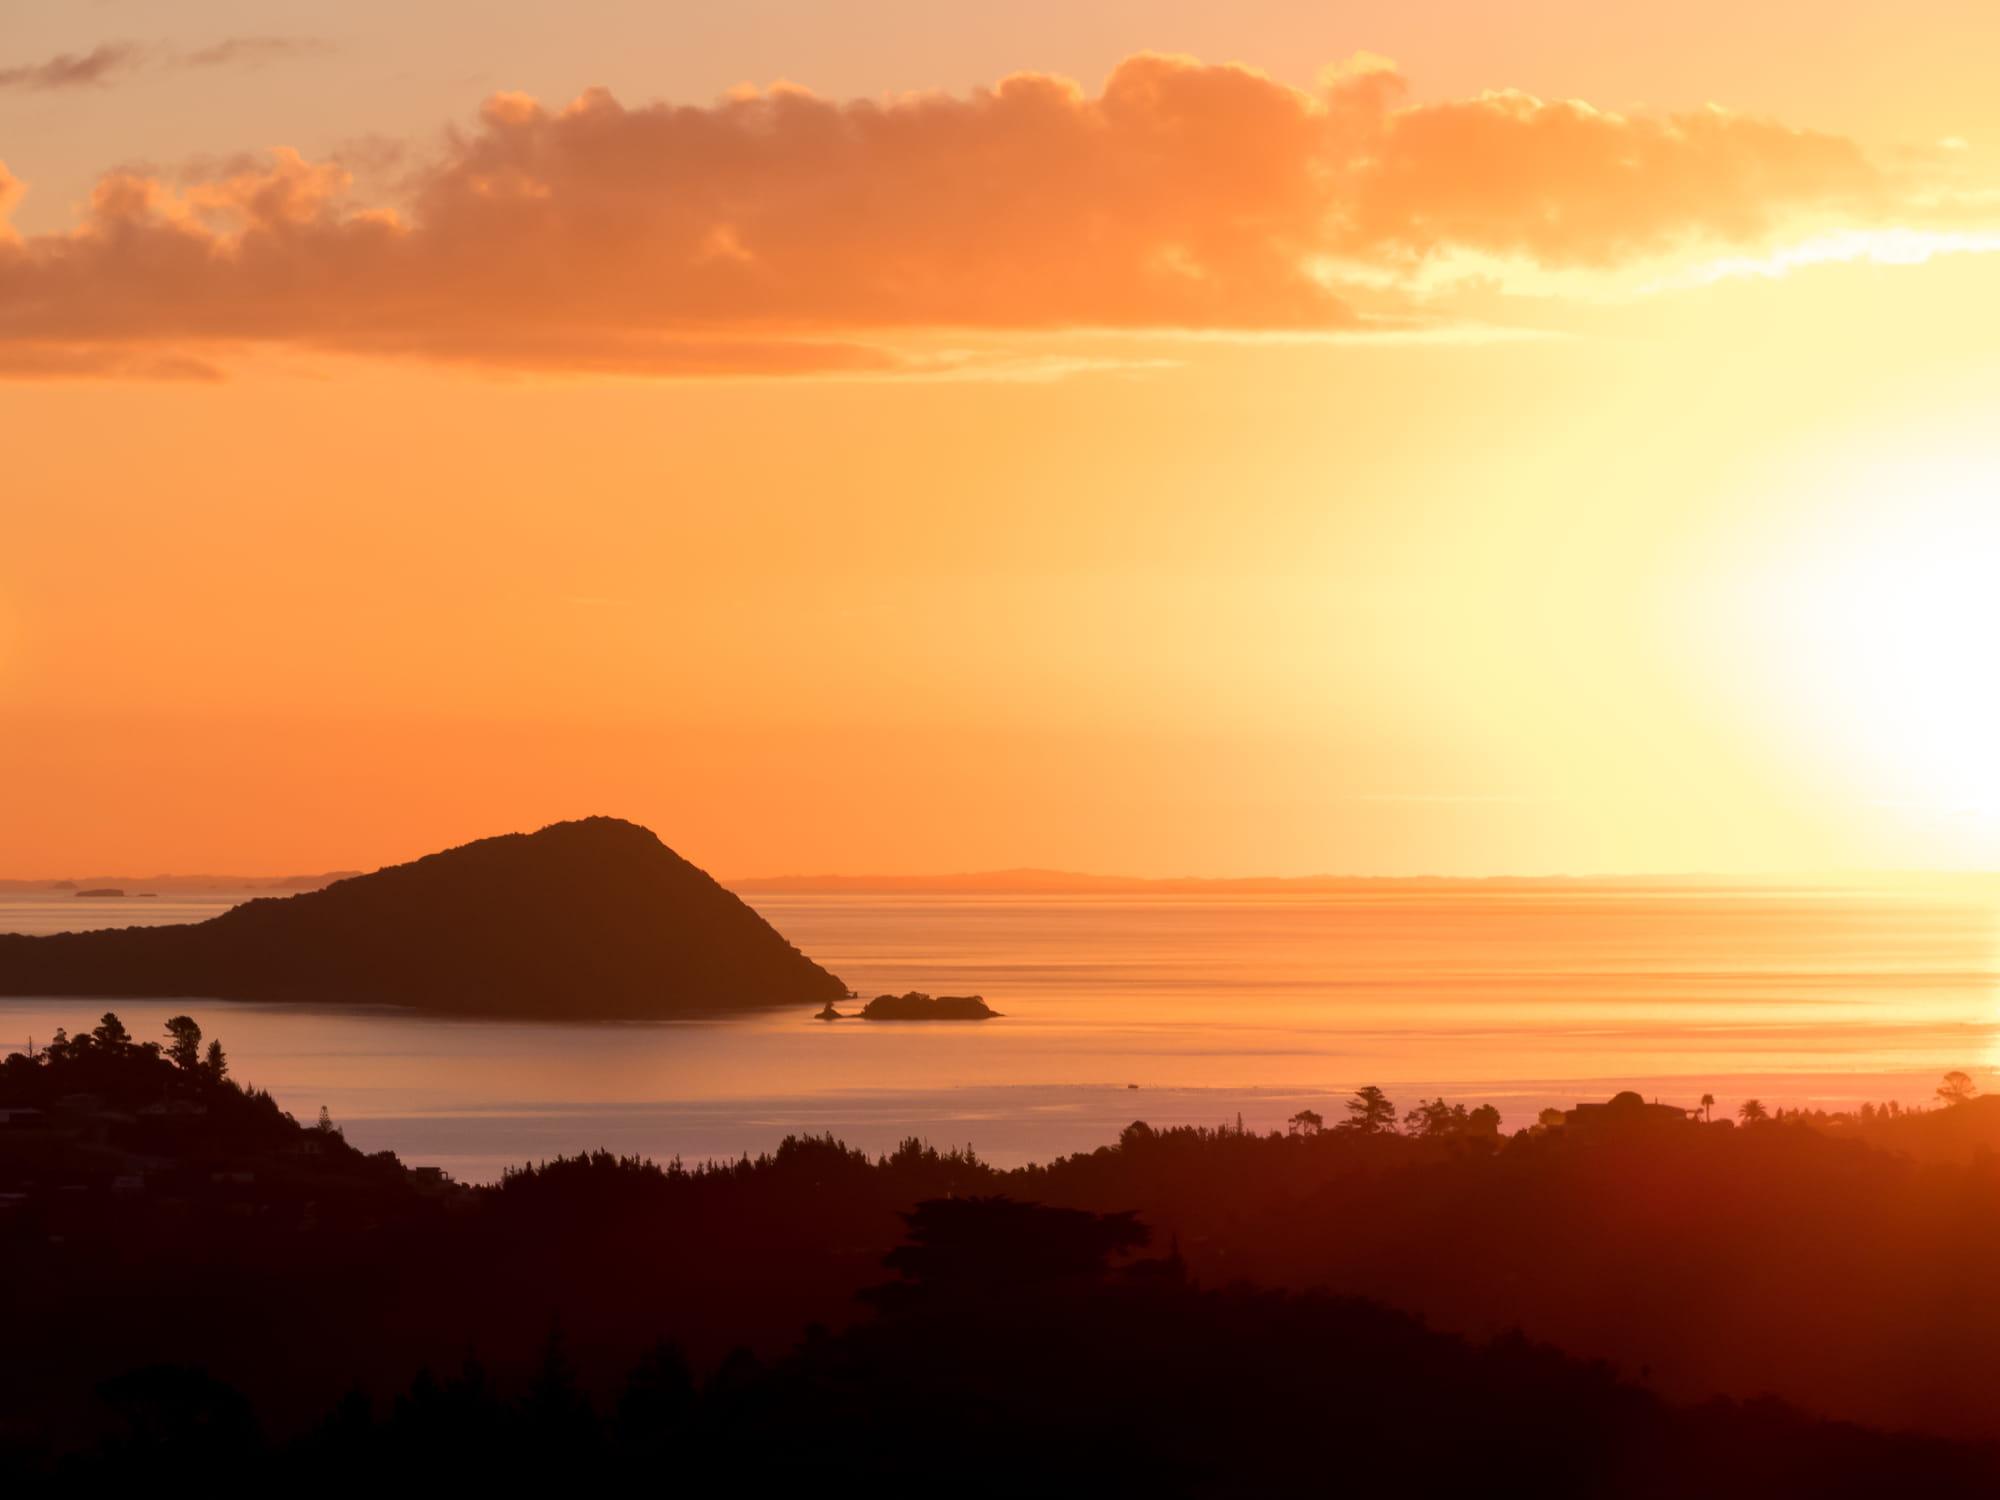 Orange sunset with small island